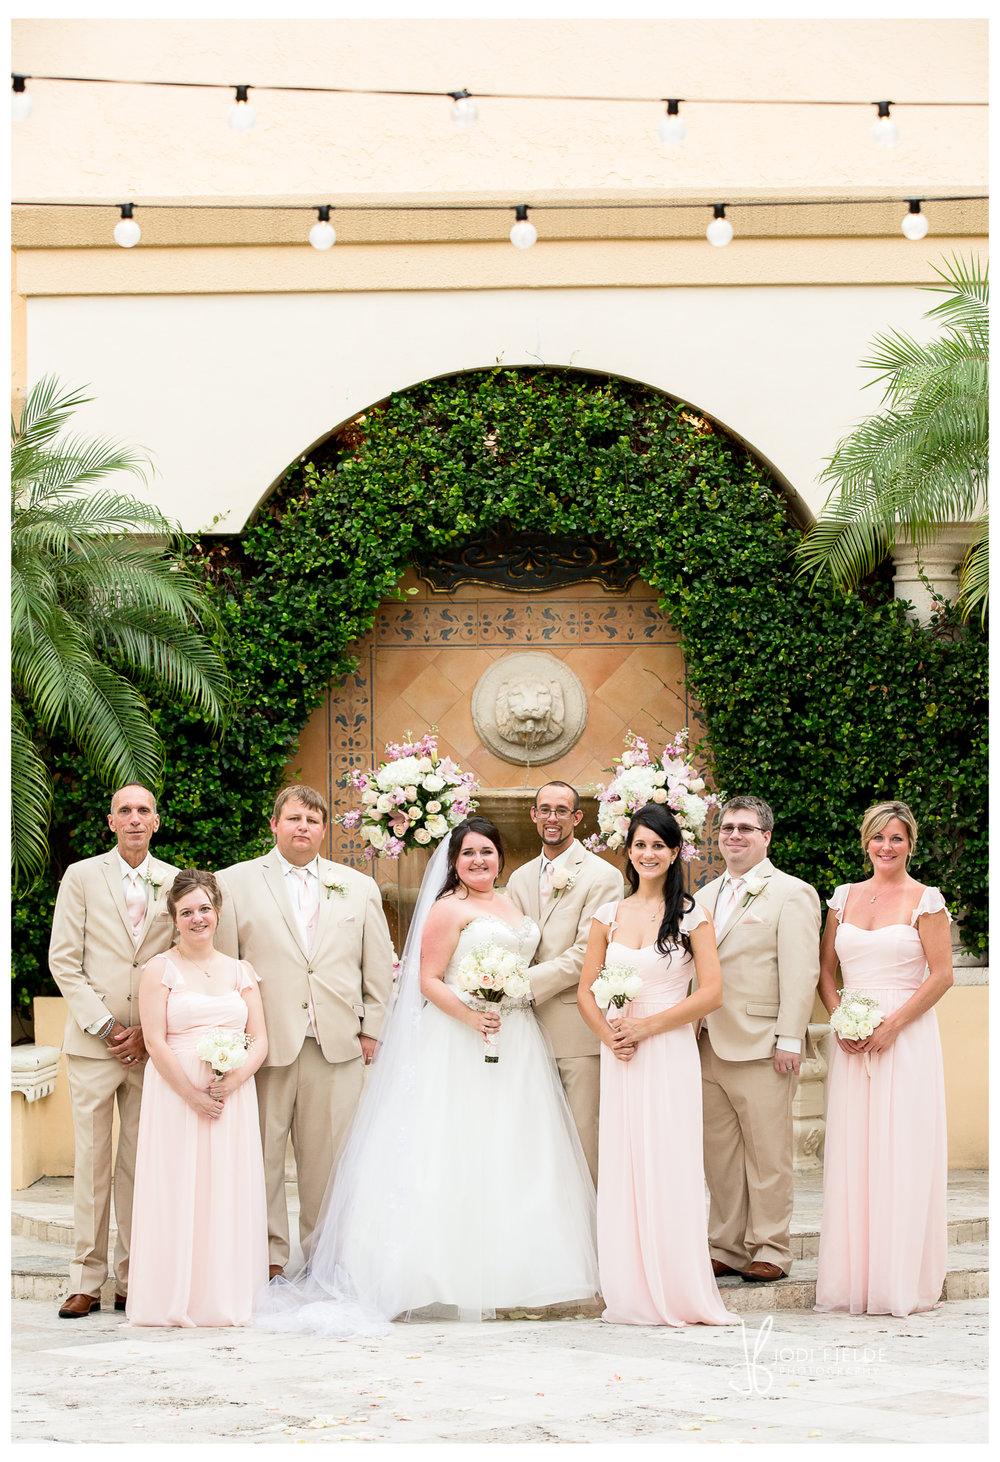 Benvenuto_Boynton Beach_ Wedding_Emily_&_Shawn 23.jpg